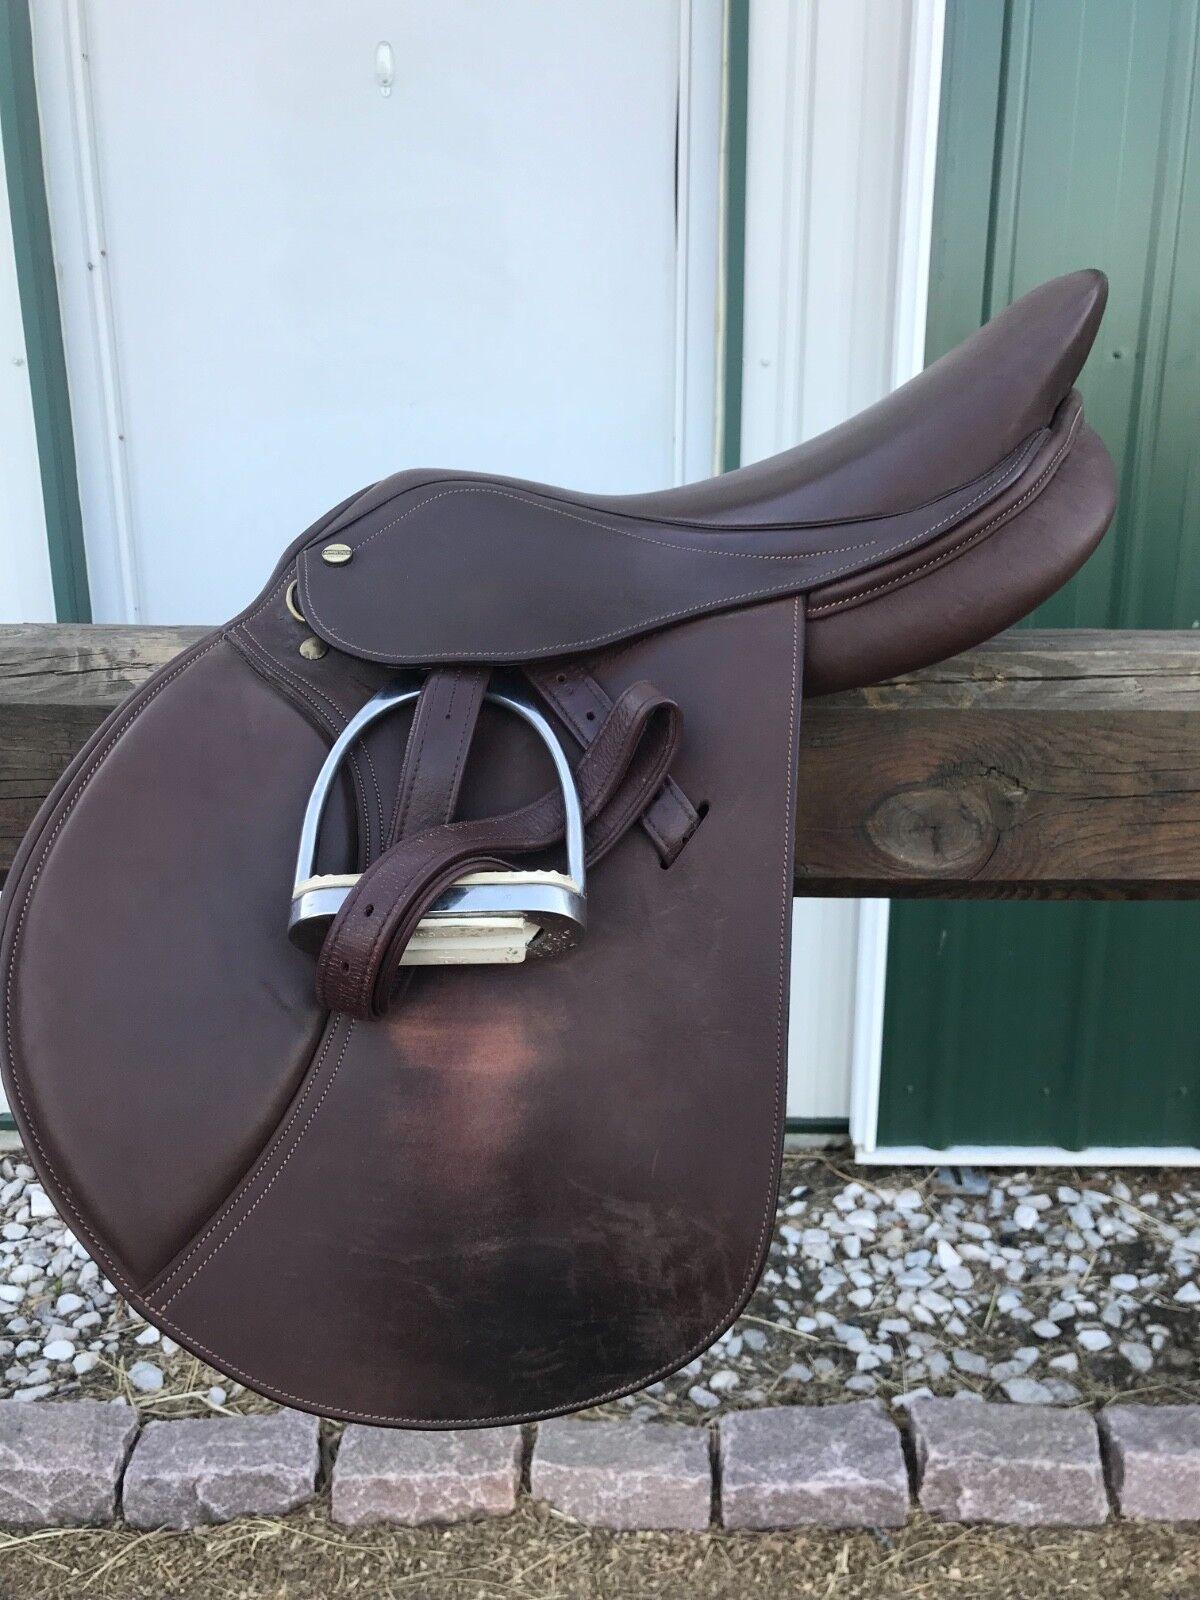 Hdr close contact advantage  saddle  the best after-sale service